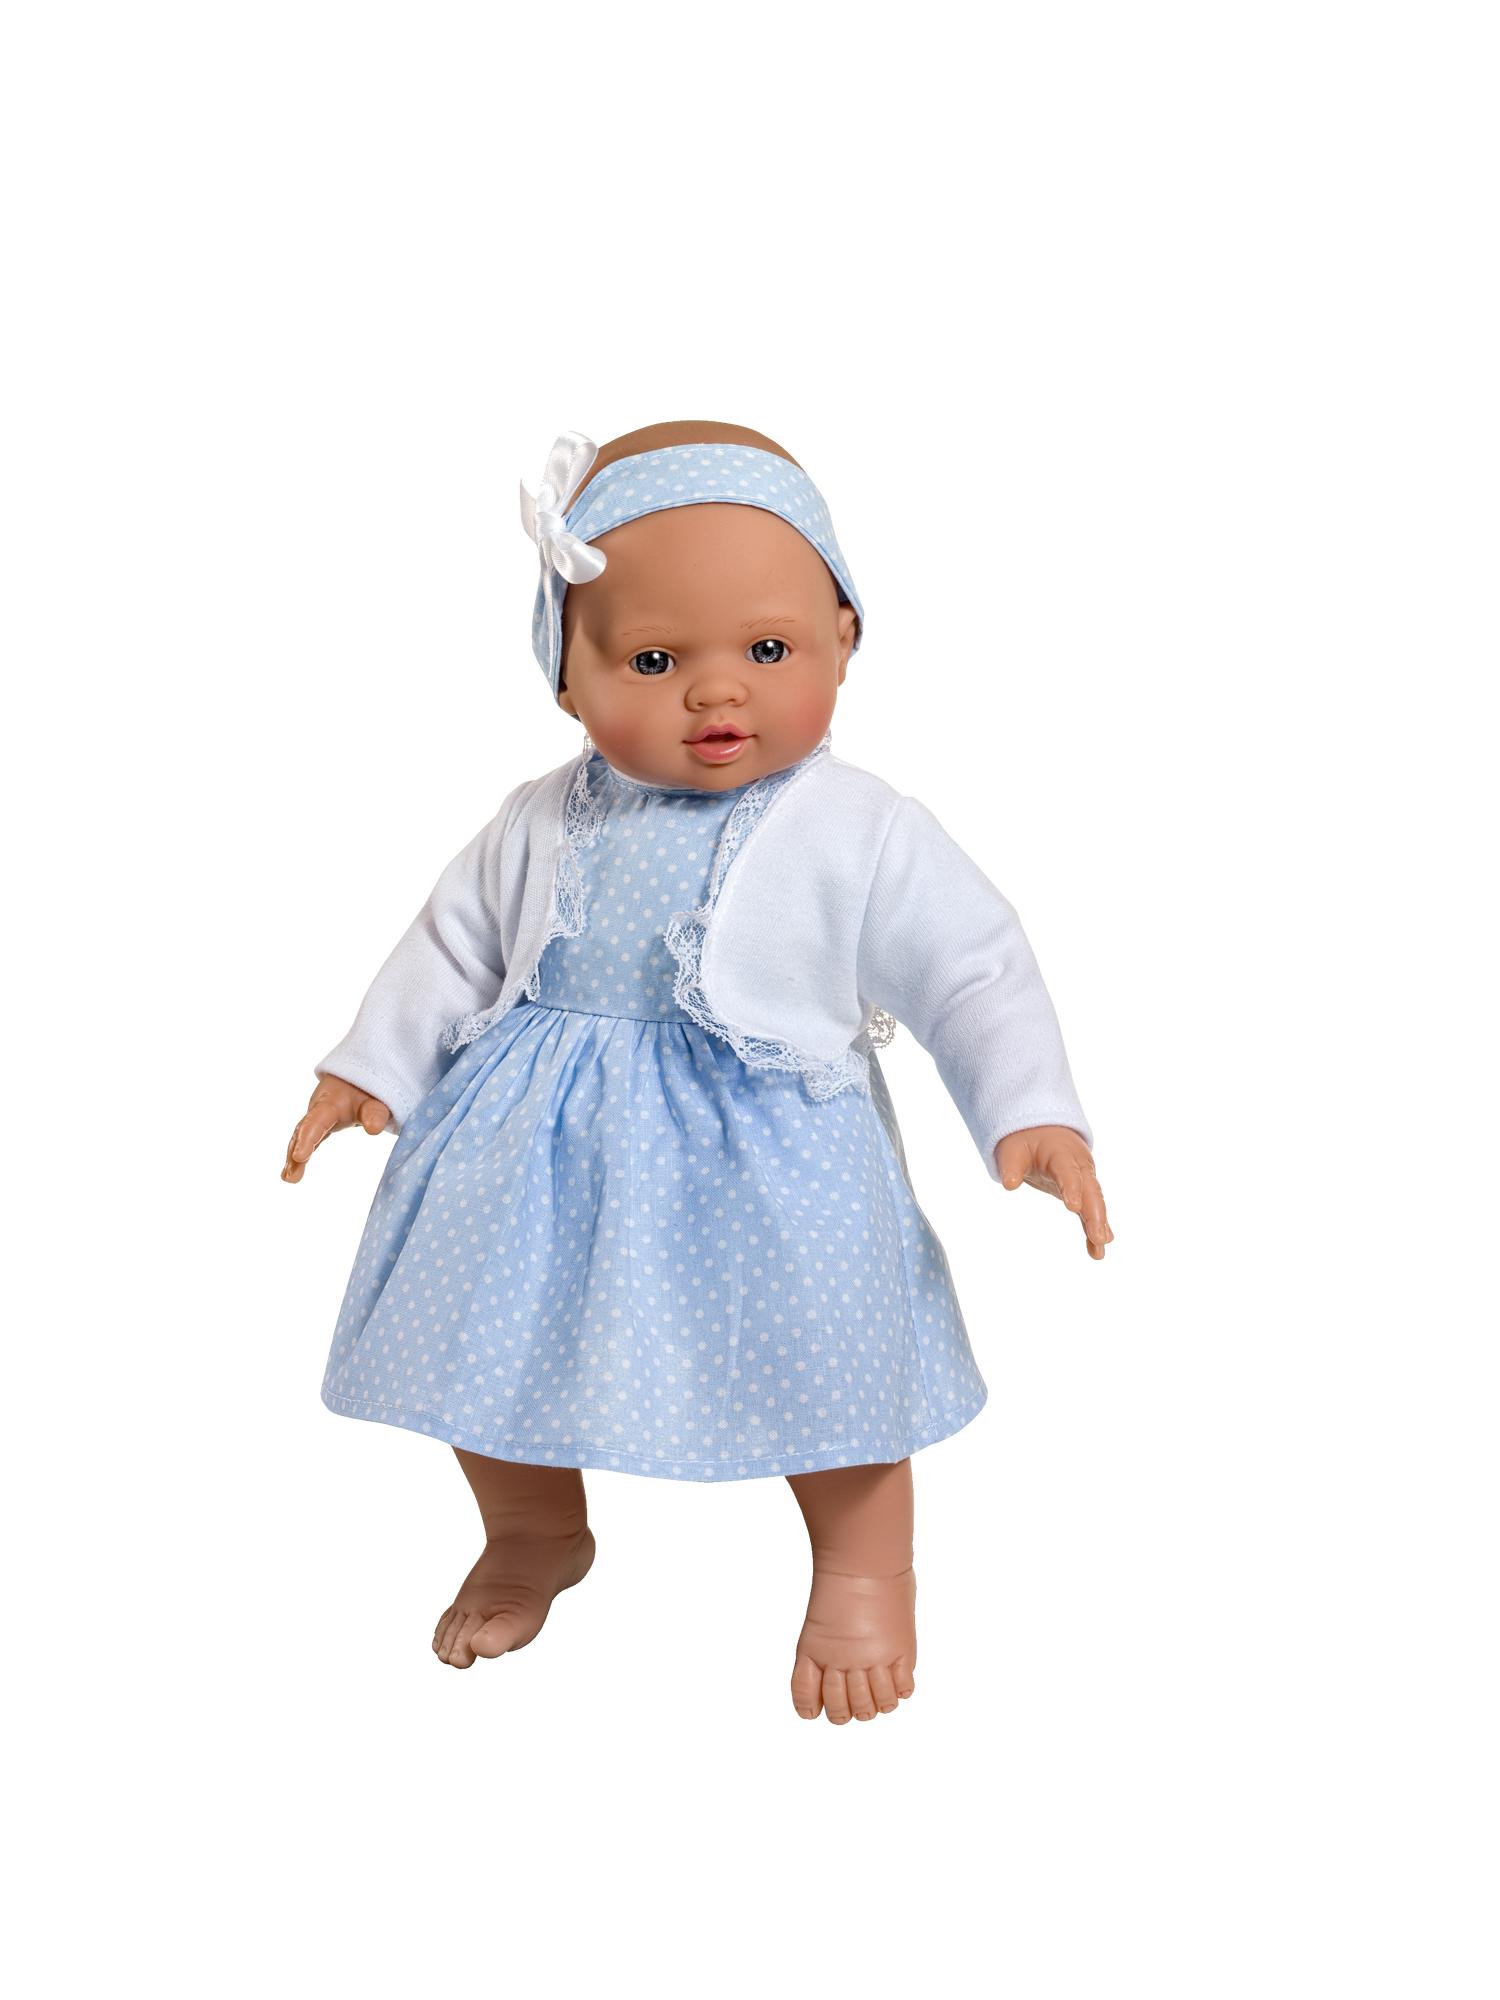 Кукла Popo в голубом платьице, 36 см.Куклы ASI (Испания)<br>Кукла Popo в голубом платьице, 36 см.<br>